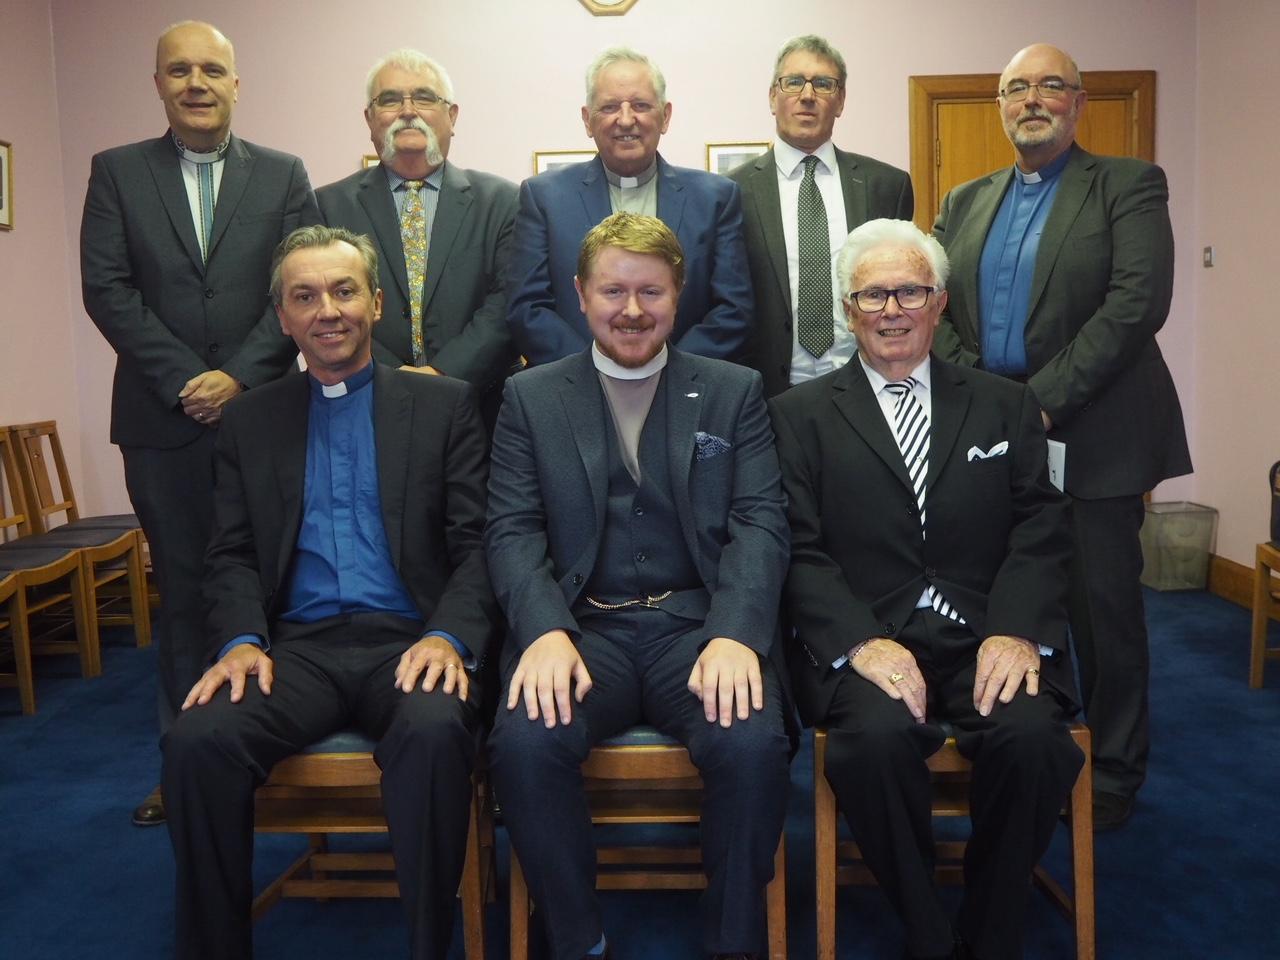 Back Row: Rev Albin Rankin (Clerk of Presbytery), Andy McCann, Rev Danny Rankin (Moderator of Presbytery), Colin McRoberts, Rev Robert Beggs (Vacancy Commission) Front Row: Rev Stephen Moore (Vacancy Convenor), Rev Edward McKenzie, Dennison Mahood (Clerk of Session)